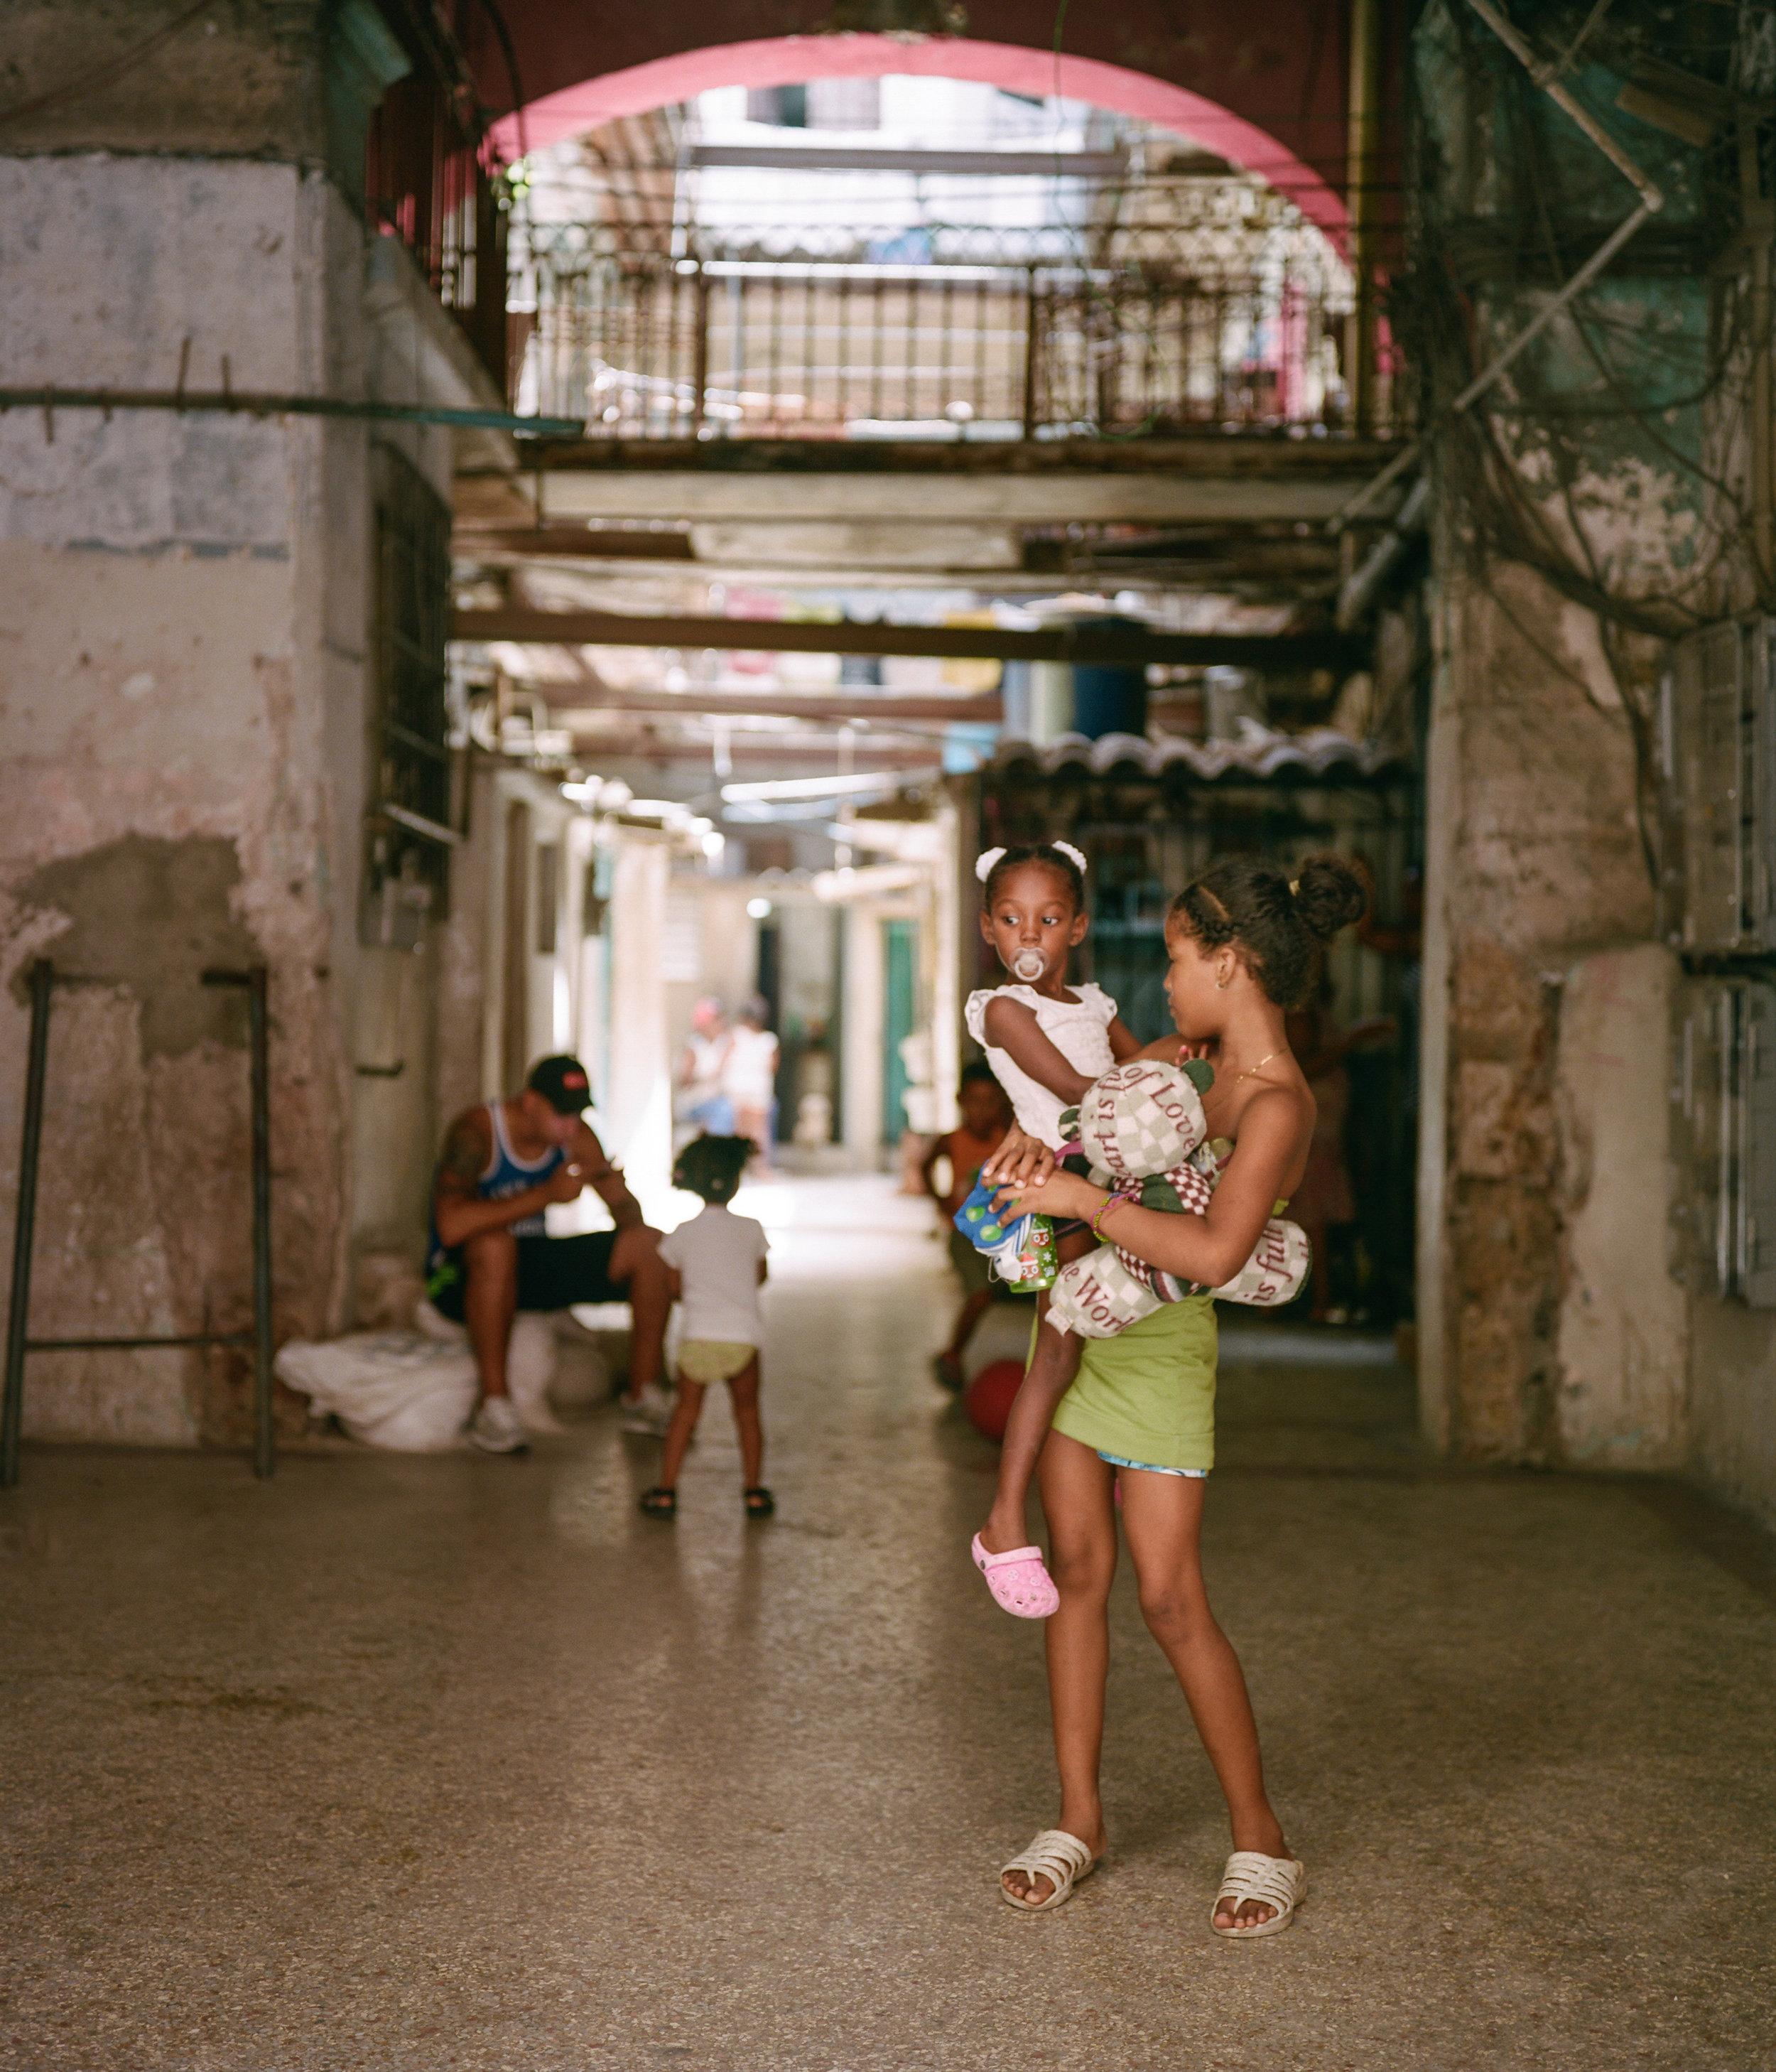 kaytona_kristin aytona_KxN_Cuba-StS-2.jpg